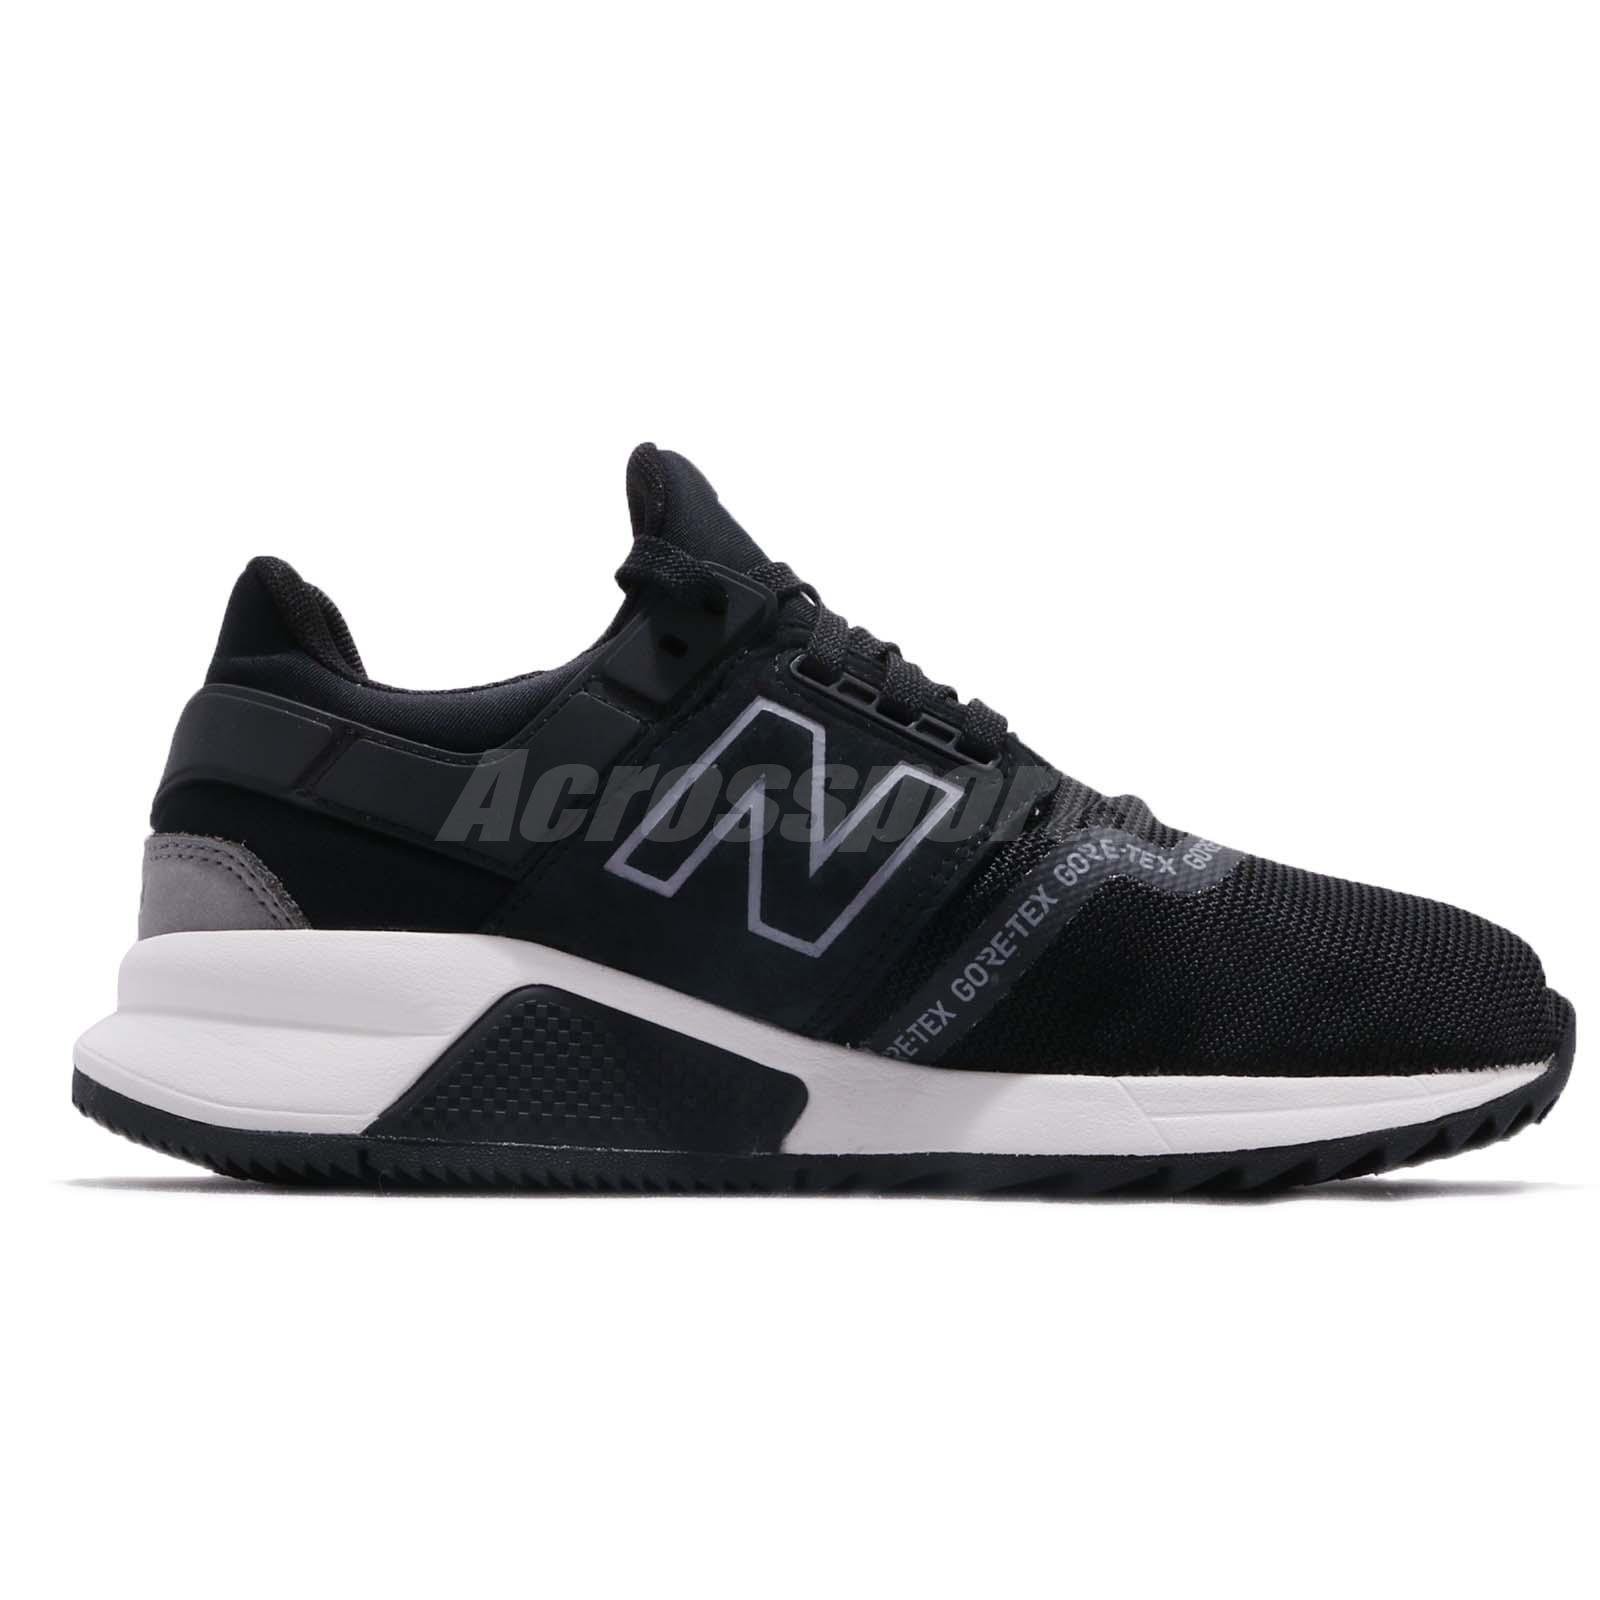 New Balance MS247GTX D Gore-Tex Black Grey Men Running Shoes ... 3926de91642